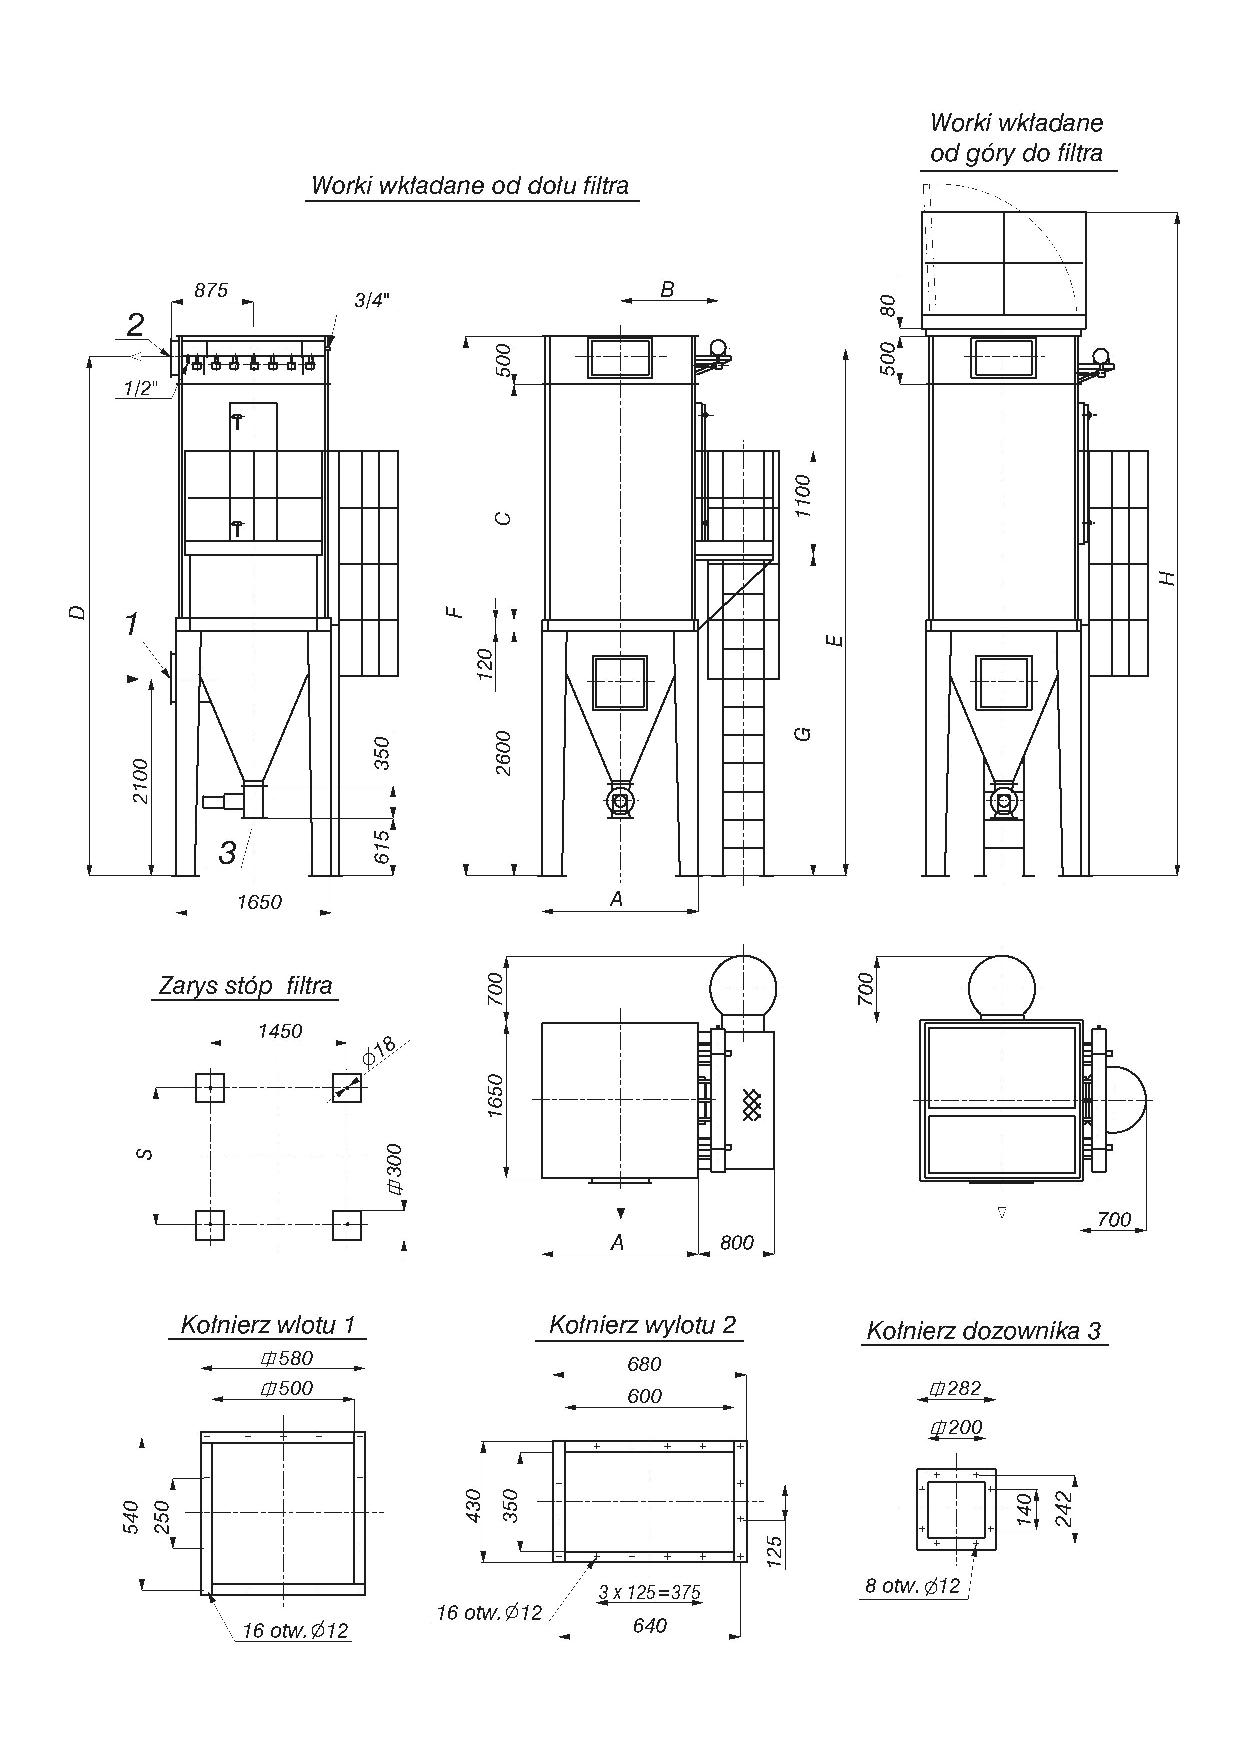 1234271092-filtr-pulsacyjny-typu-mr-pl1-page-001